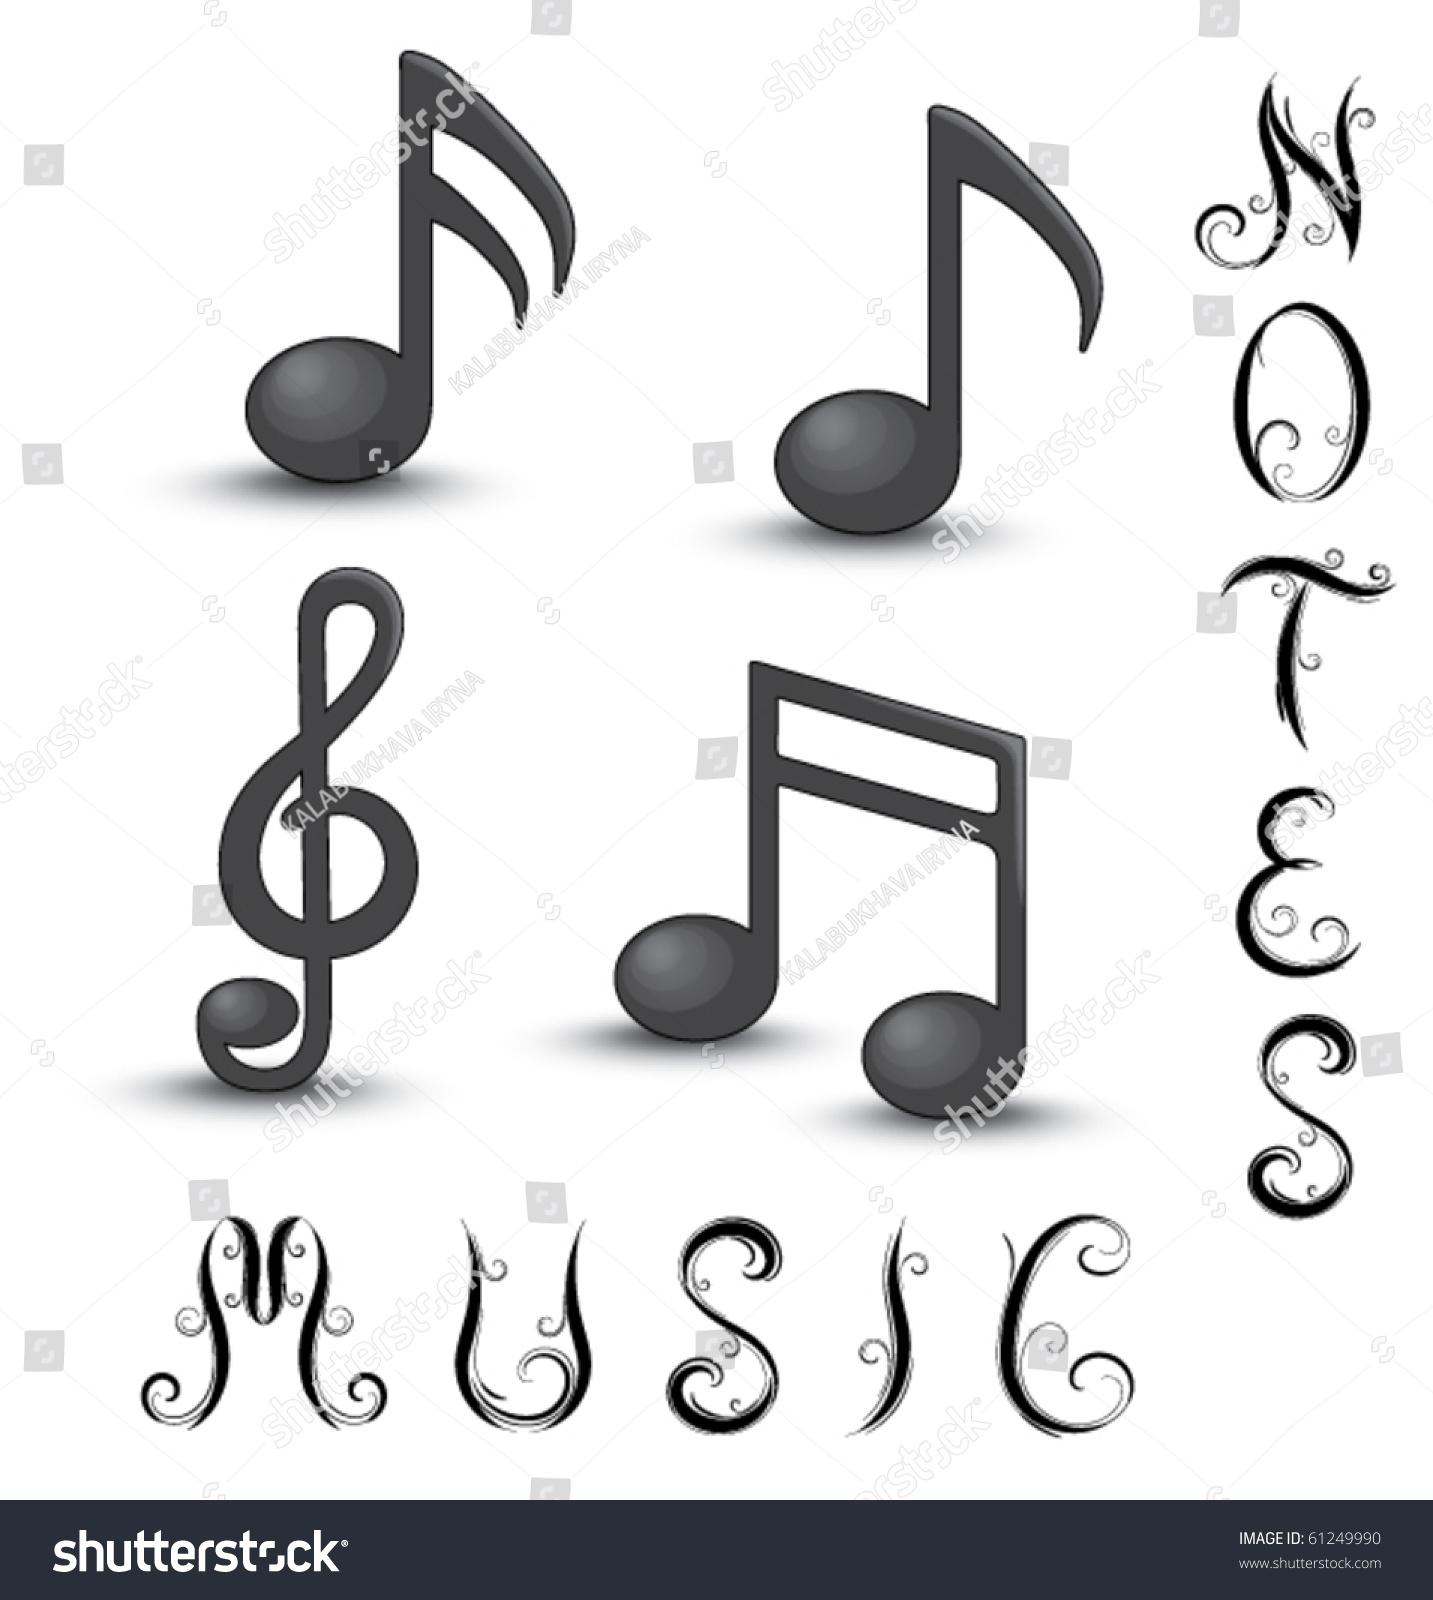 Music symbols stock vector 61249990 shutterstock music symbols buycottarizona Gallery